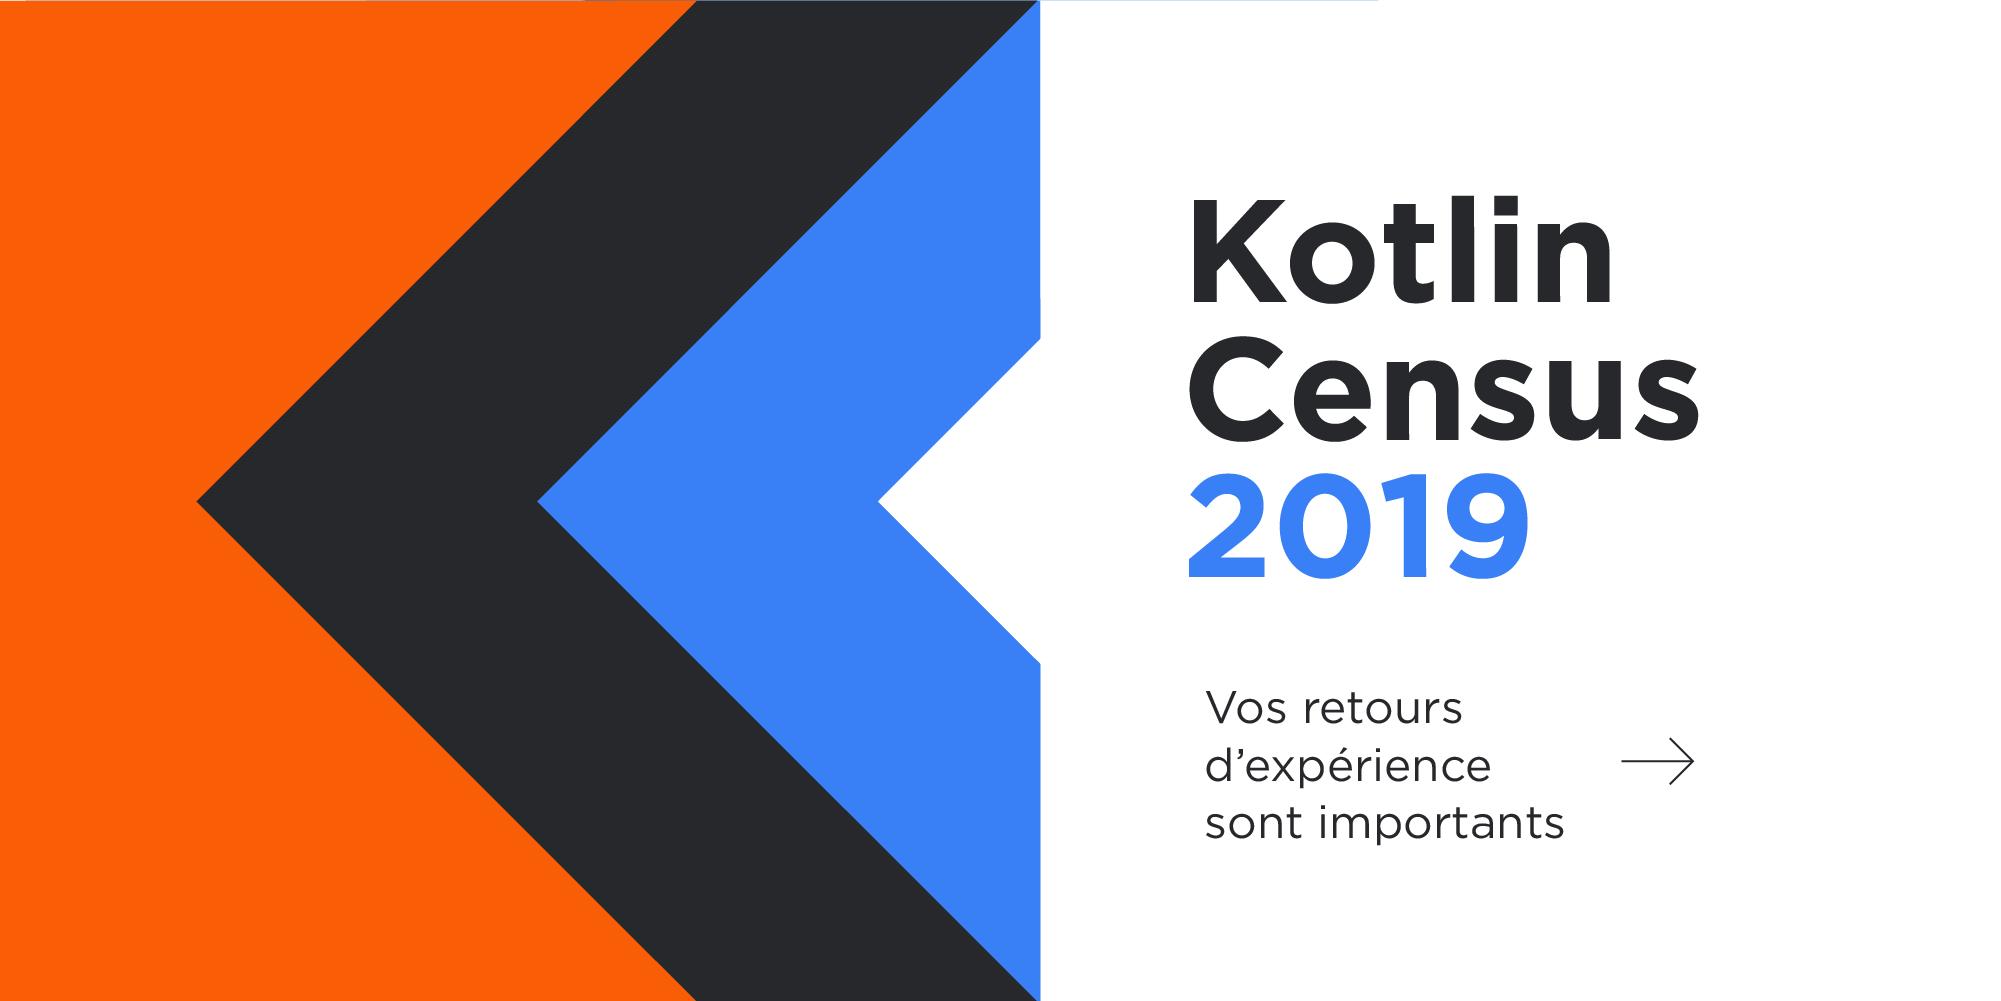 Kotlin Census 2019